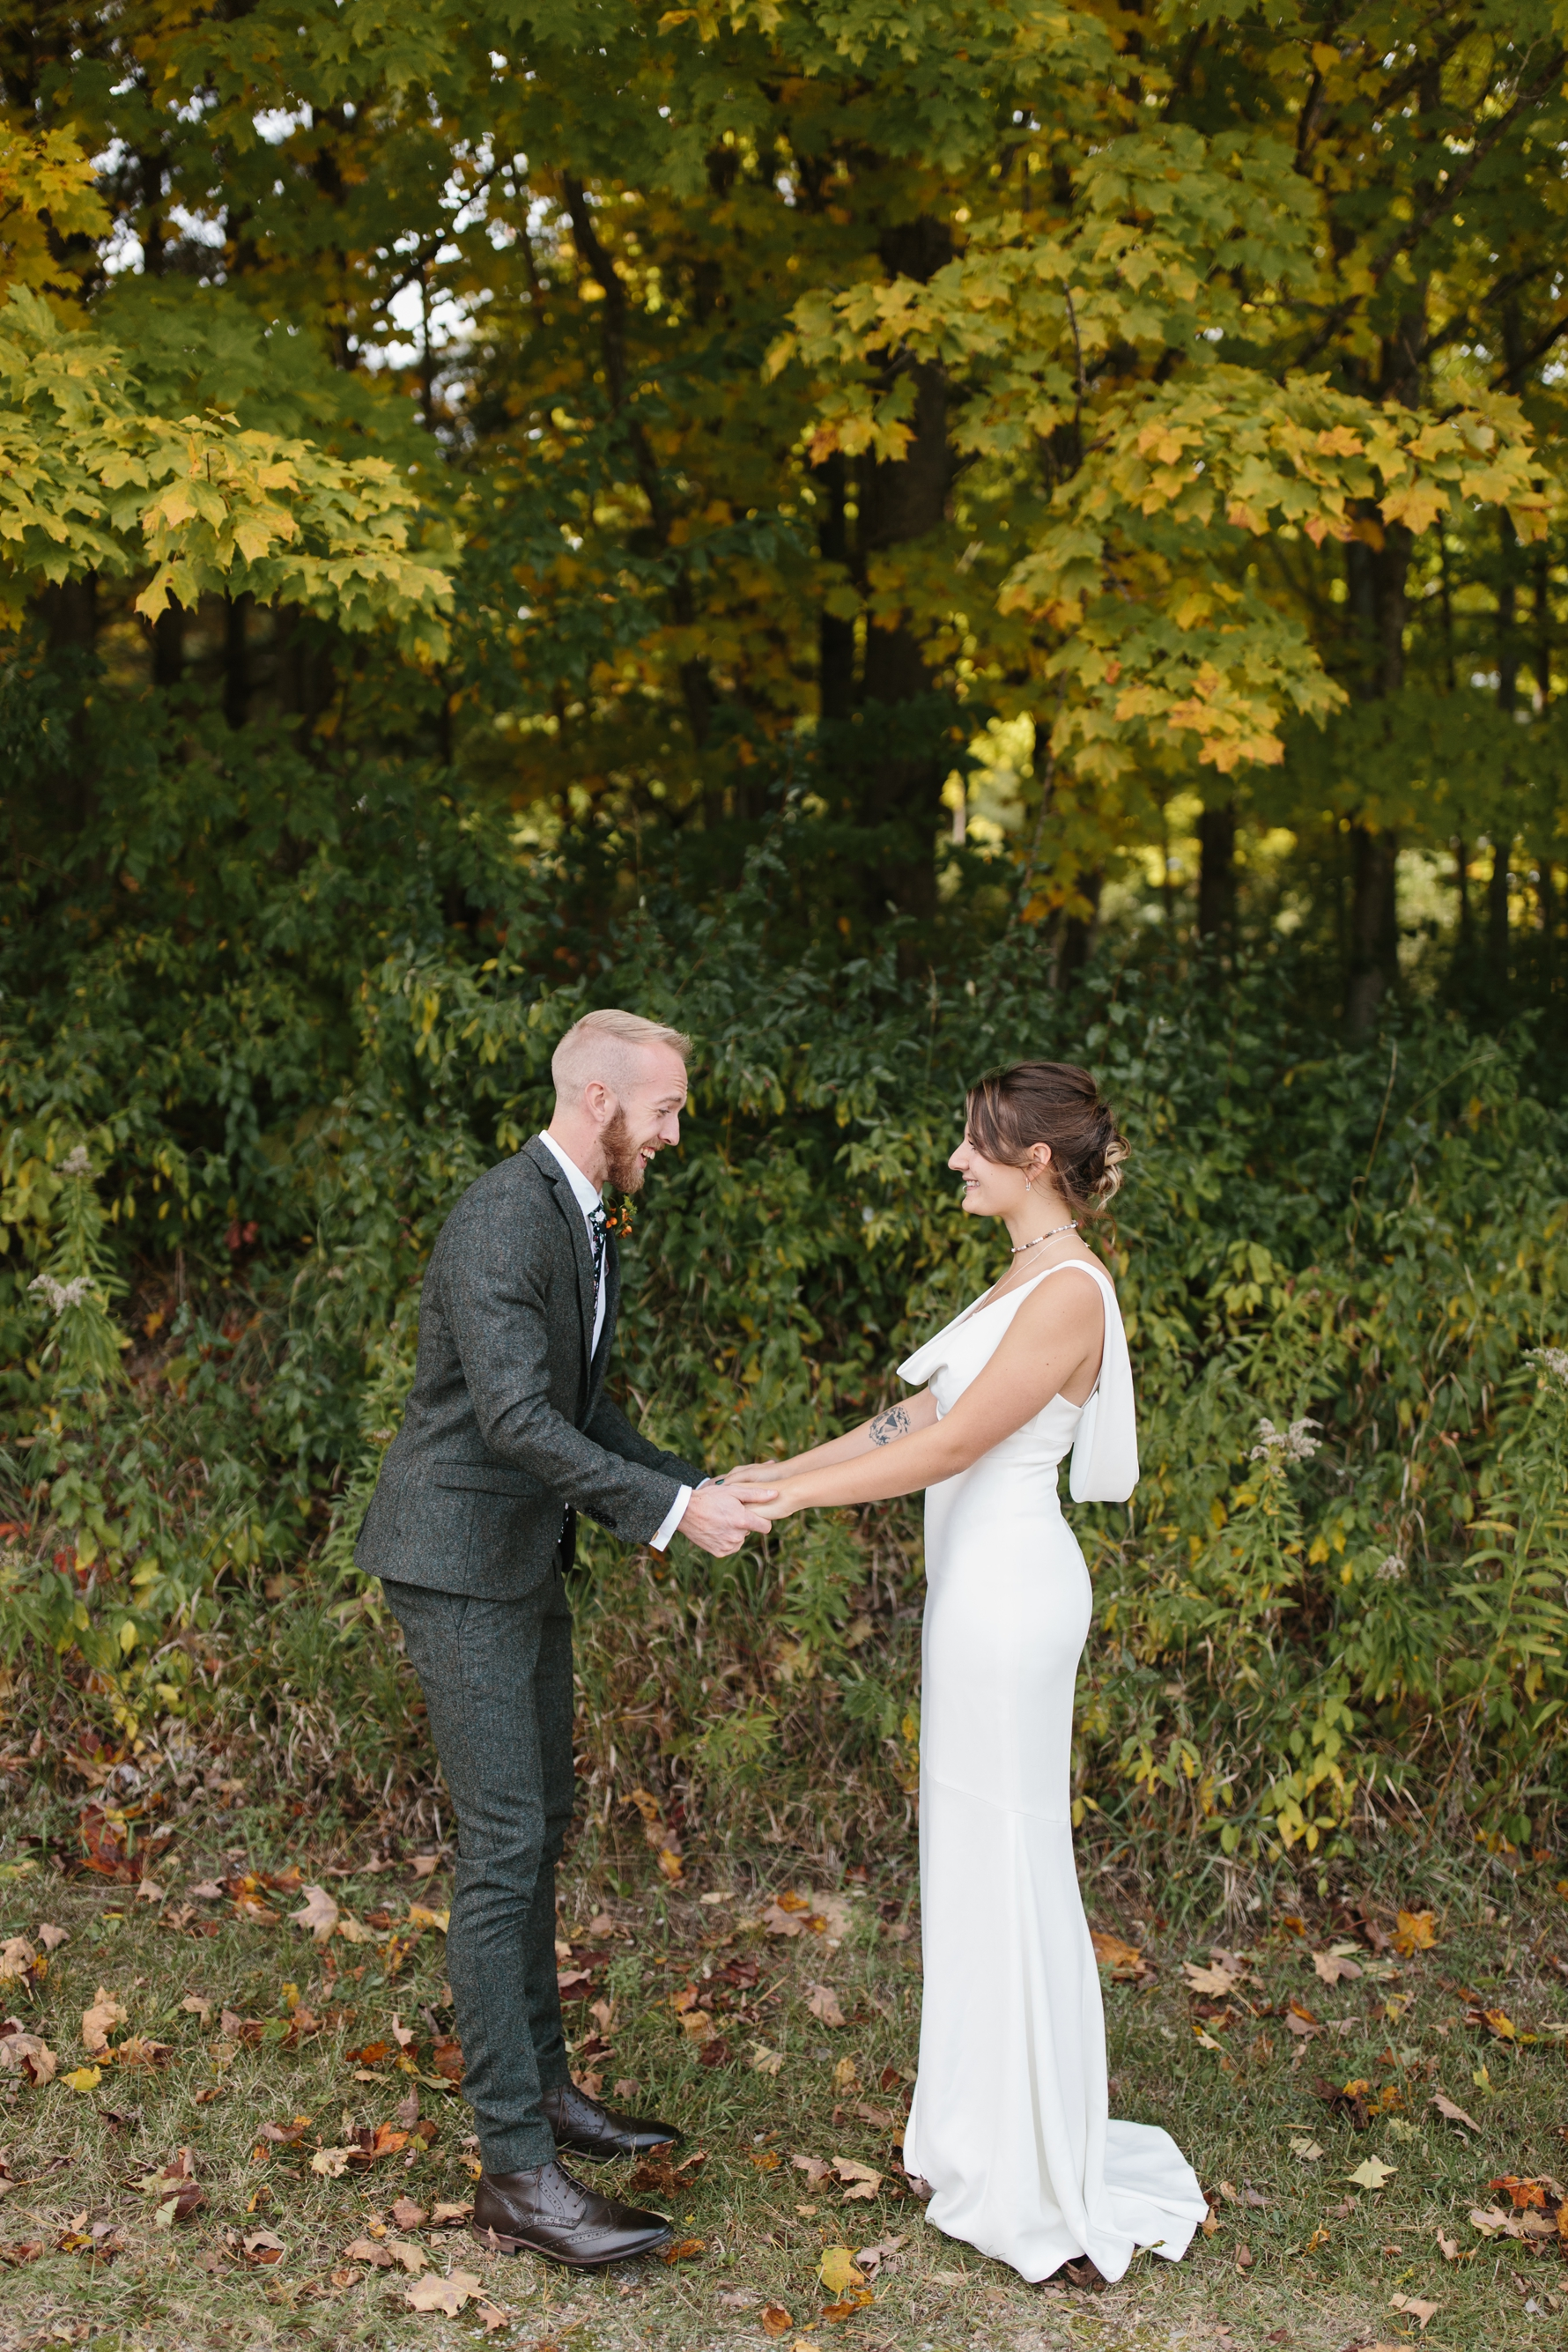 norris-traverse-city-wedding-16.JPG